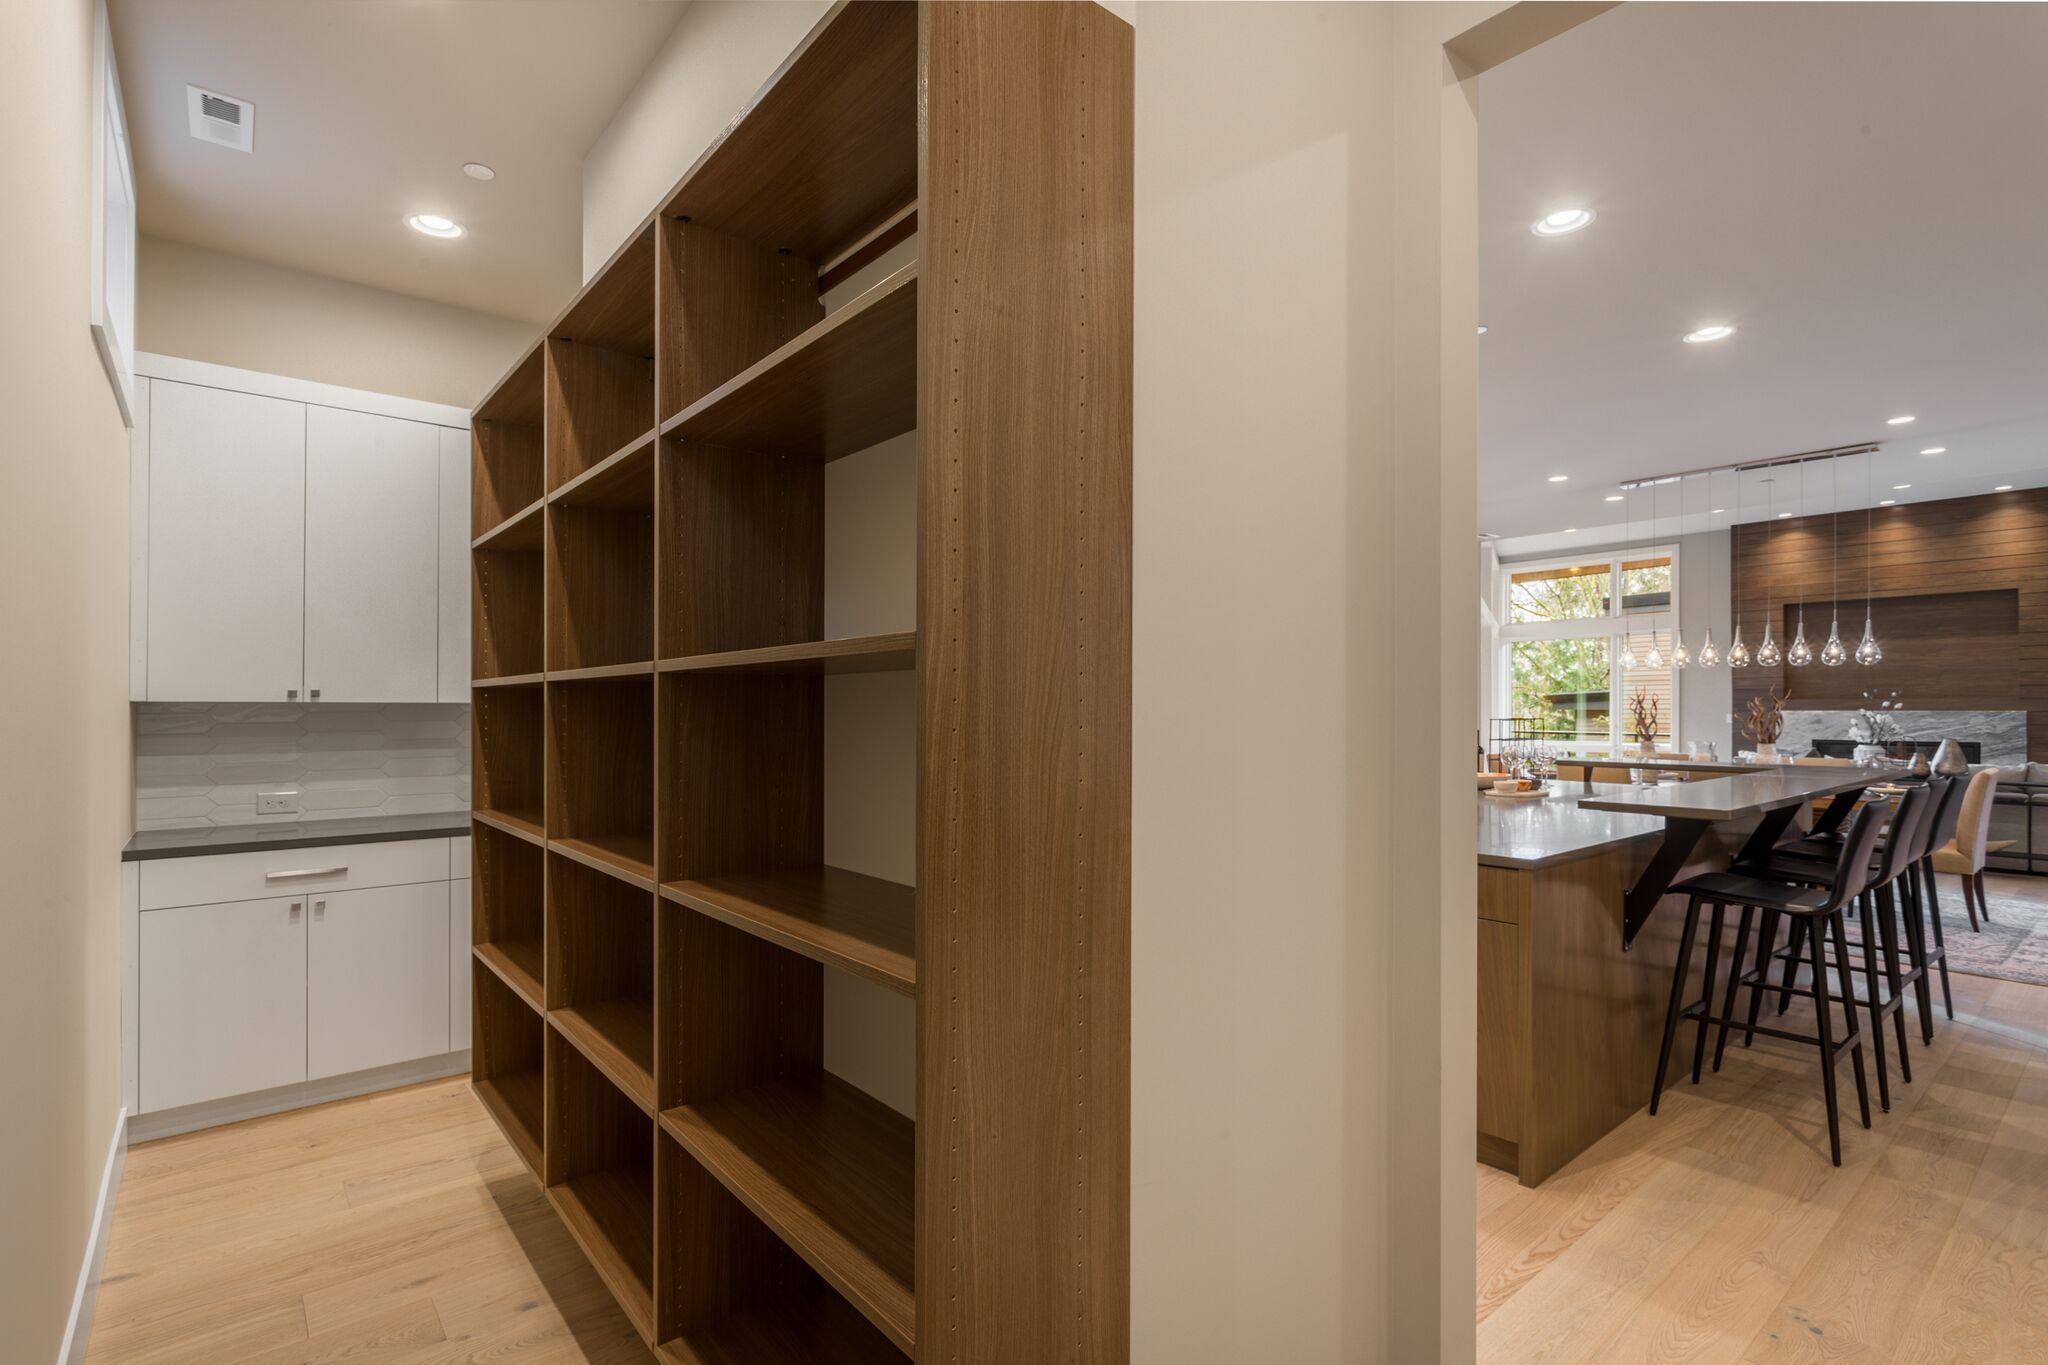 3 pantry.jpeg